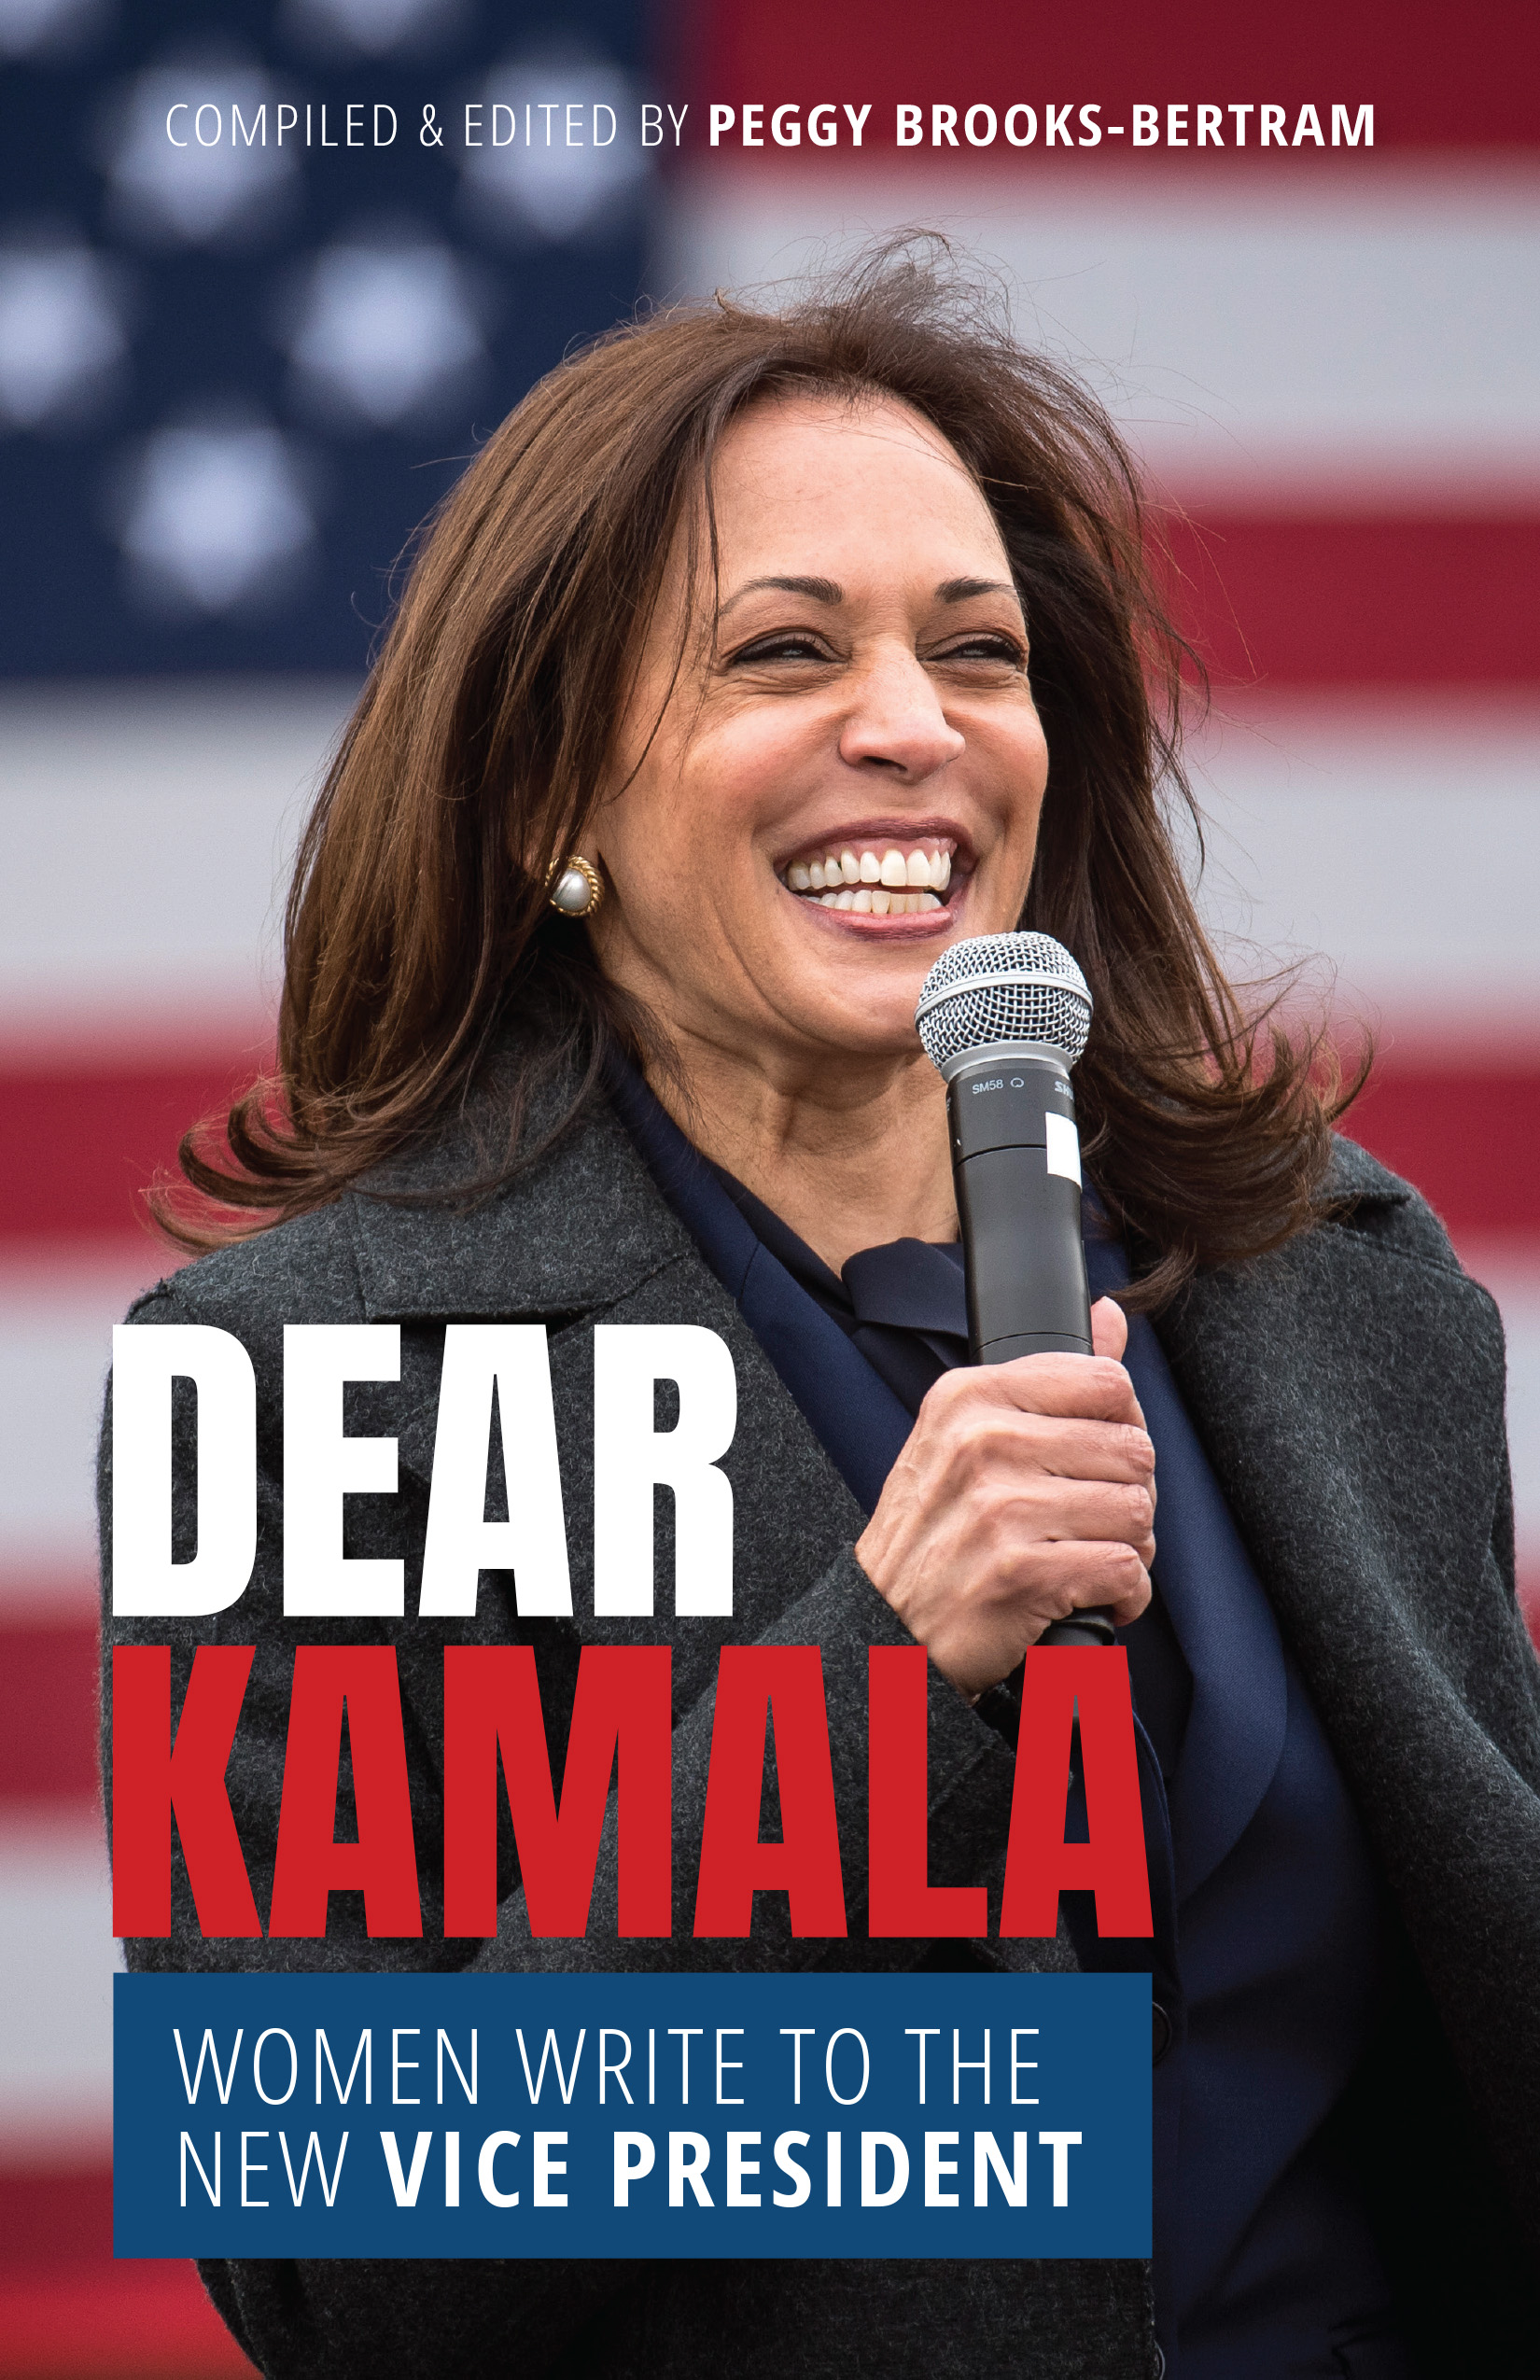 Dear Kamala: Women Write to the New Vice President